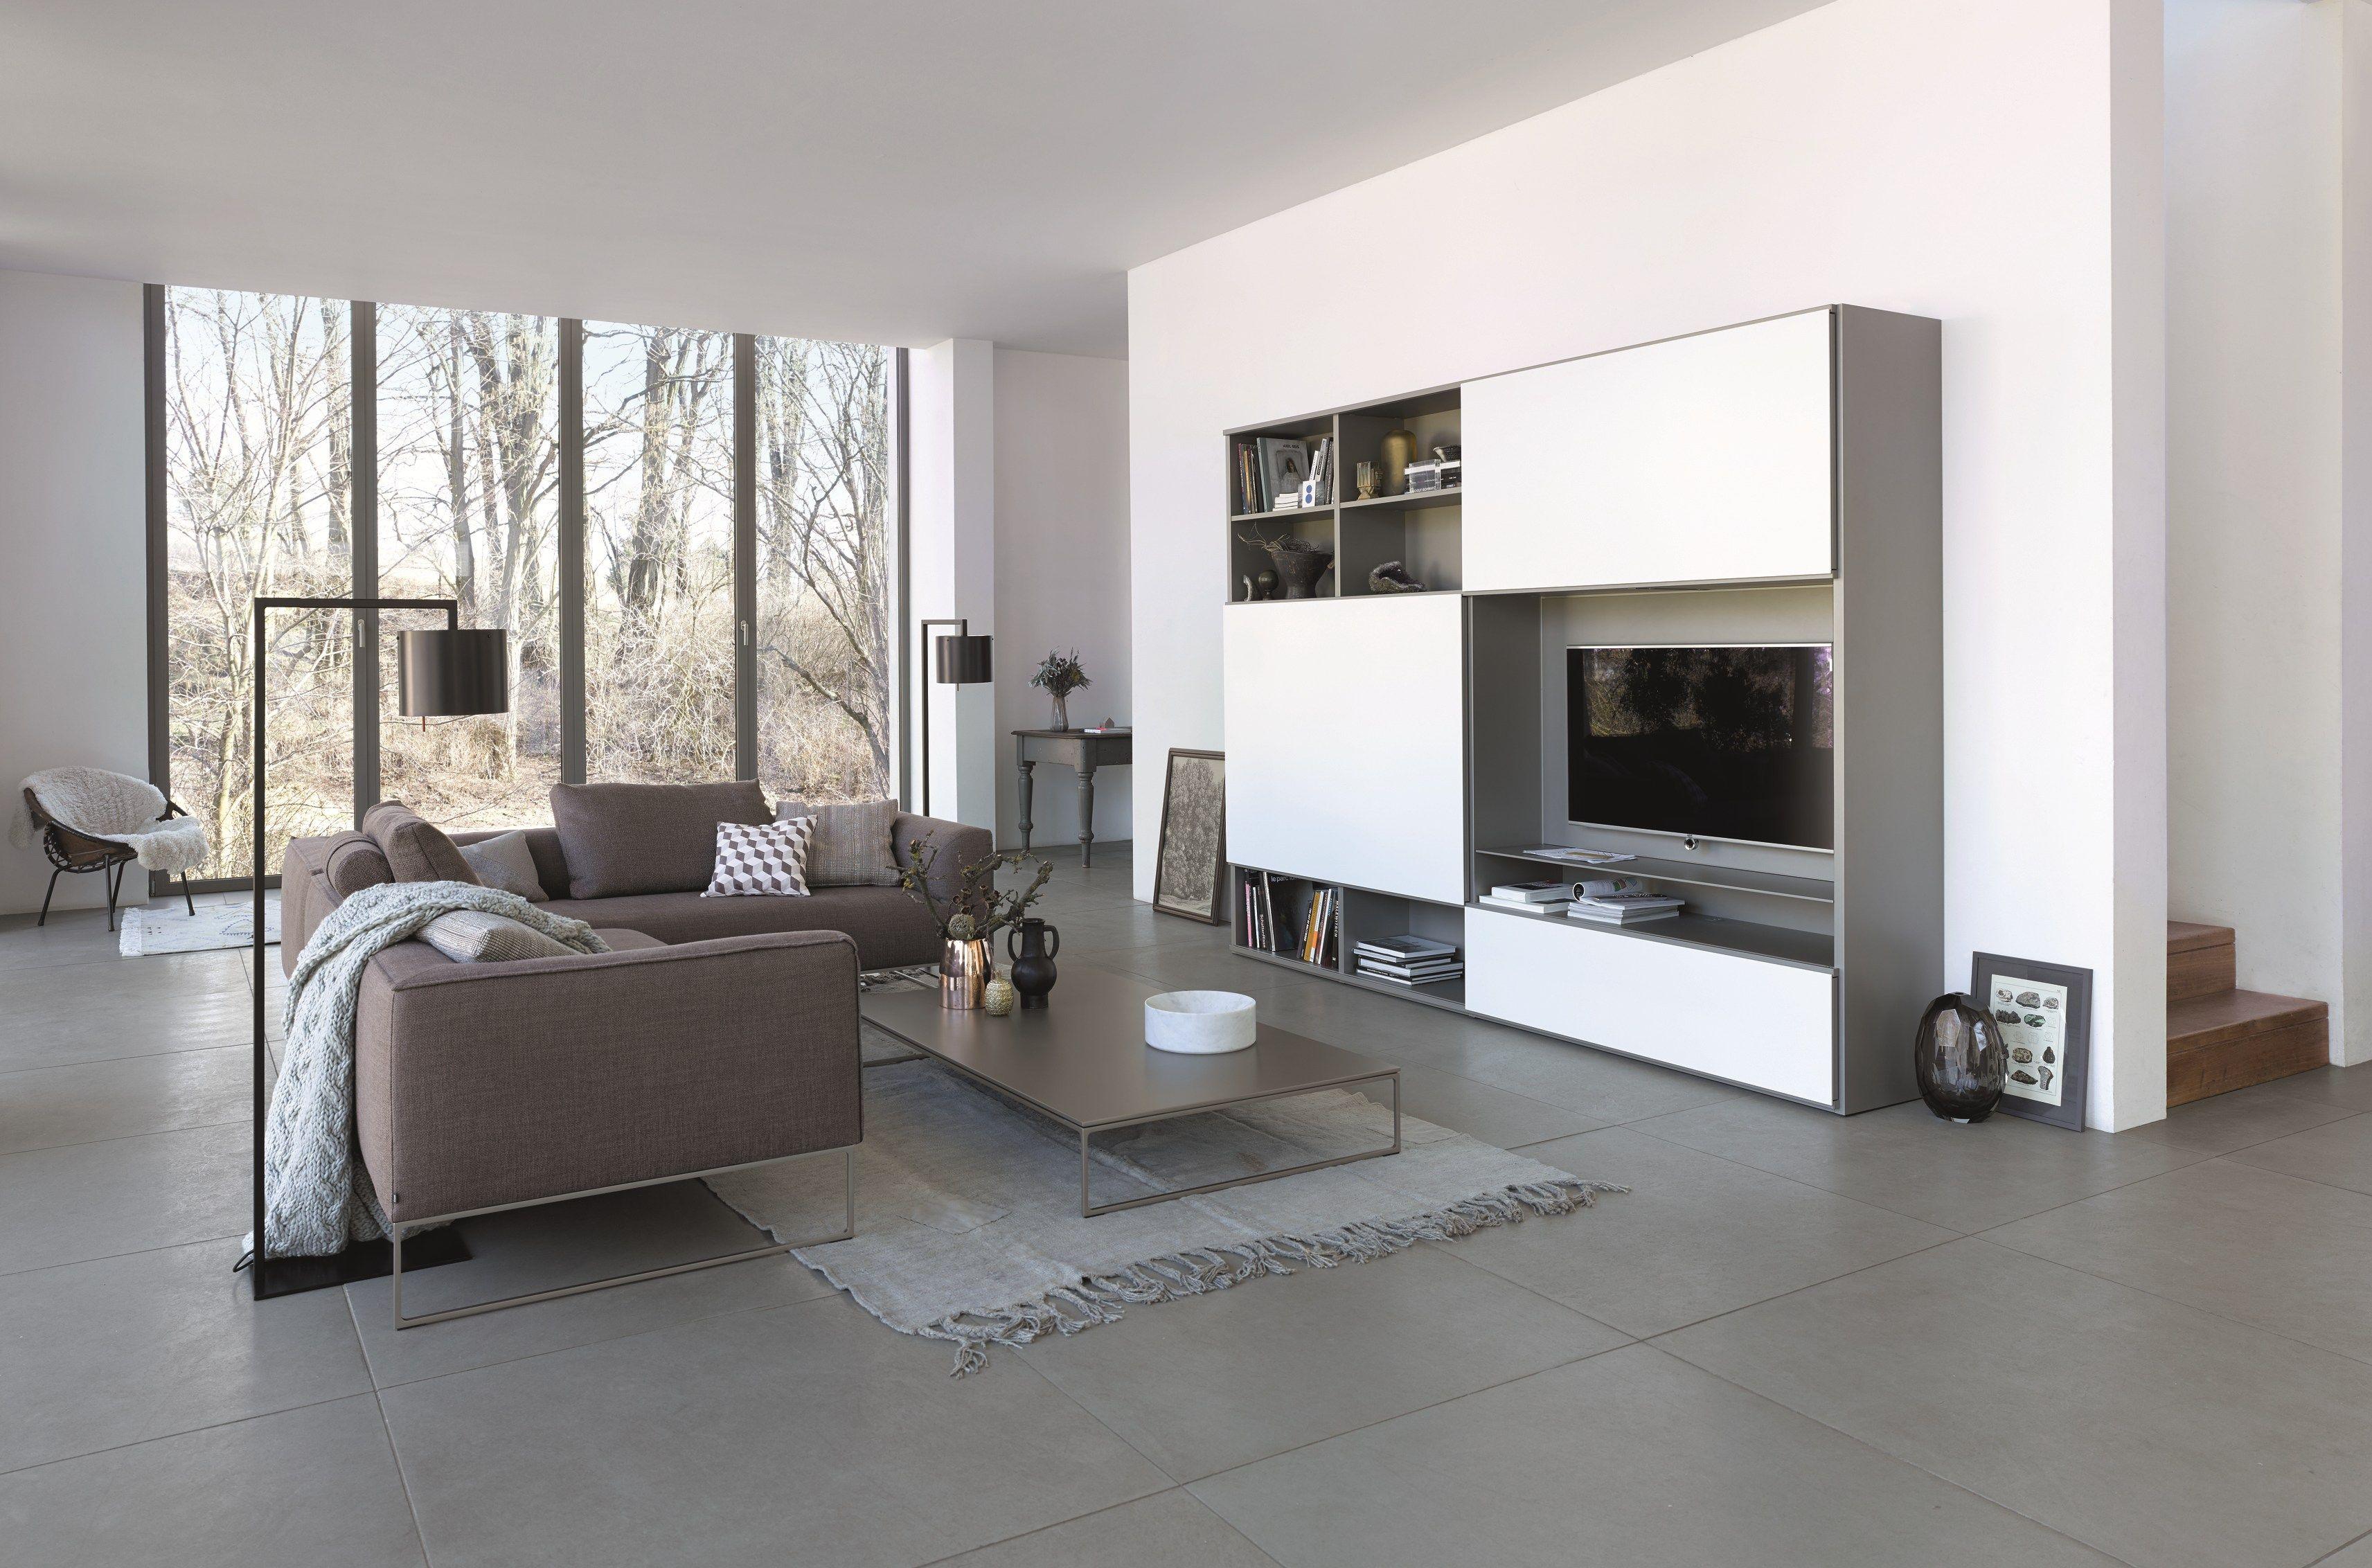 Mell Lounge Sectional Sofa By Cor Sitzmobel Helmut Lubke Design Jehs Laub Furniture Design Living Room Home Living Room Furniture